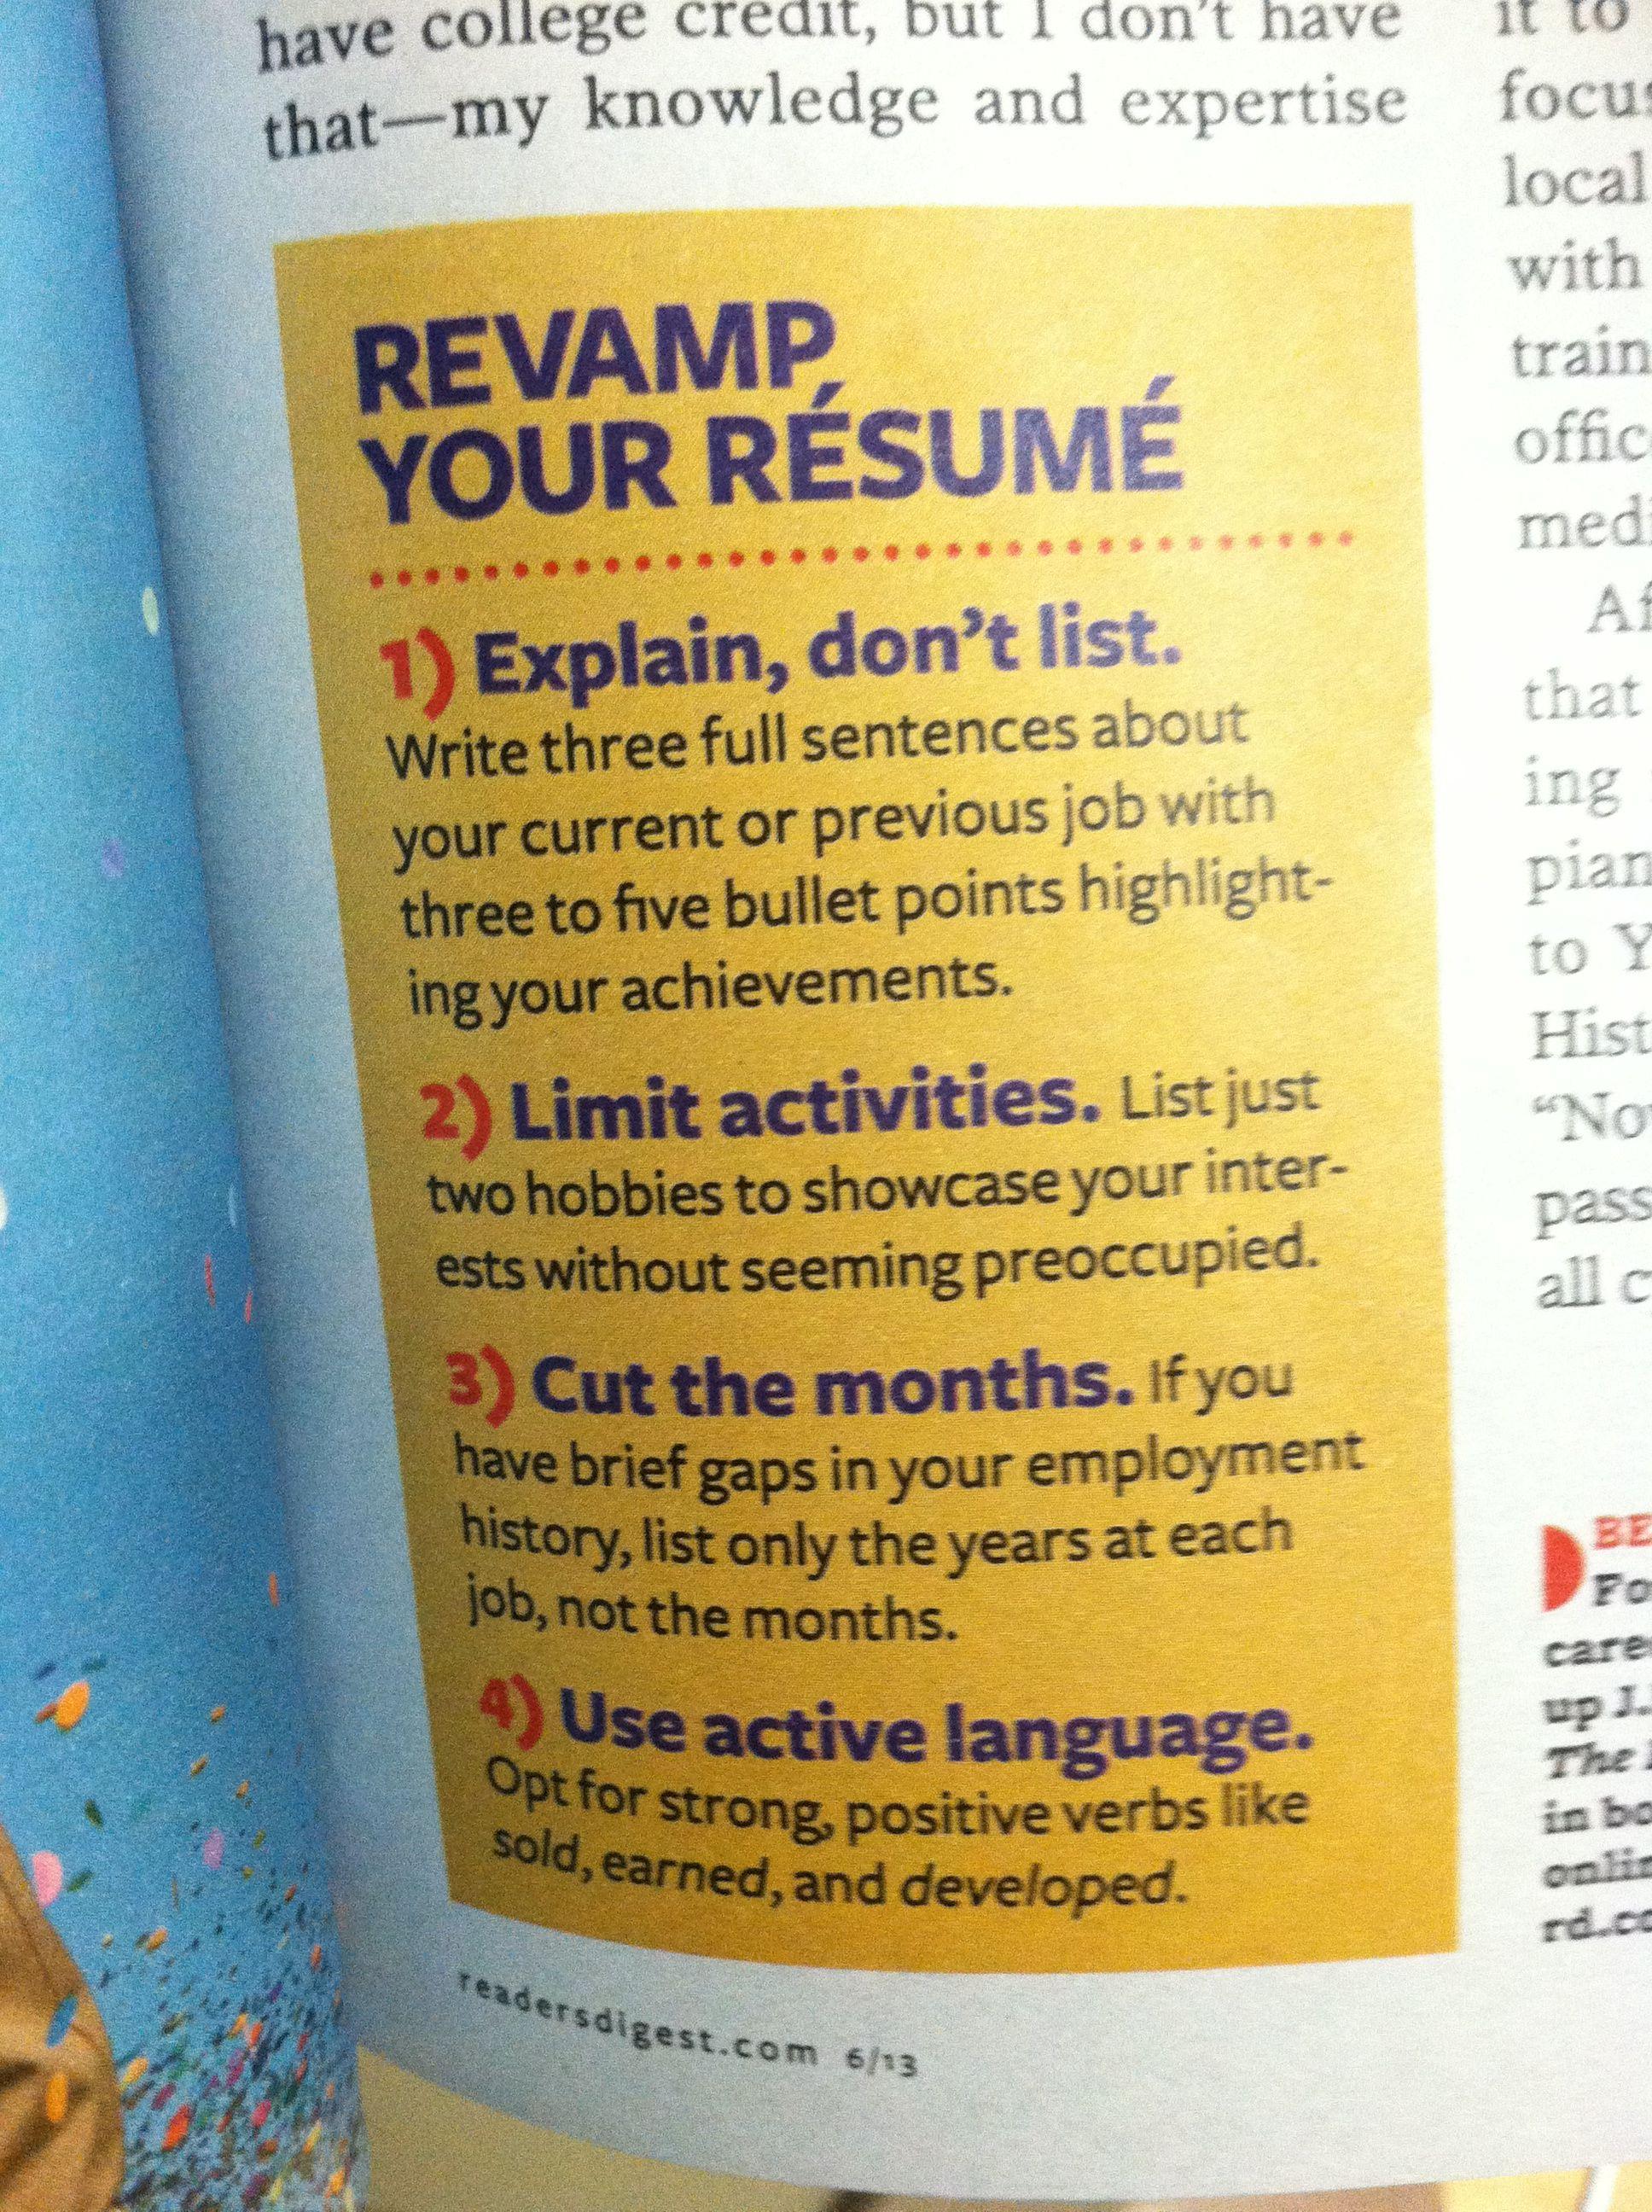 Improve your resume college credit resume improve